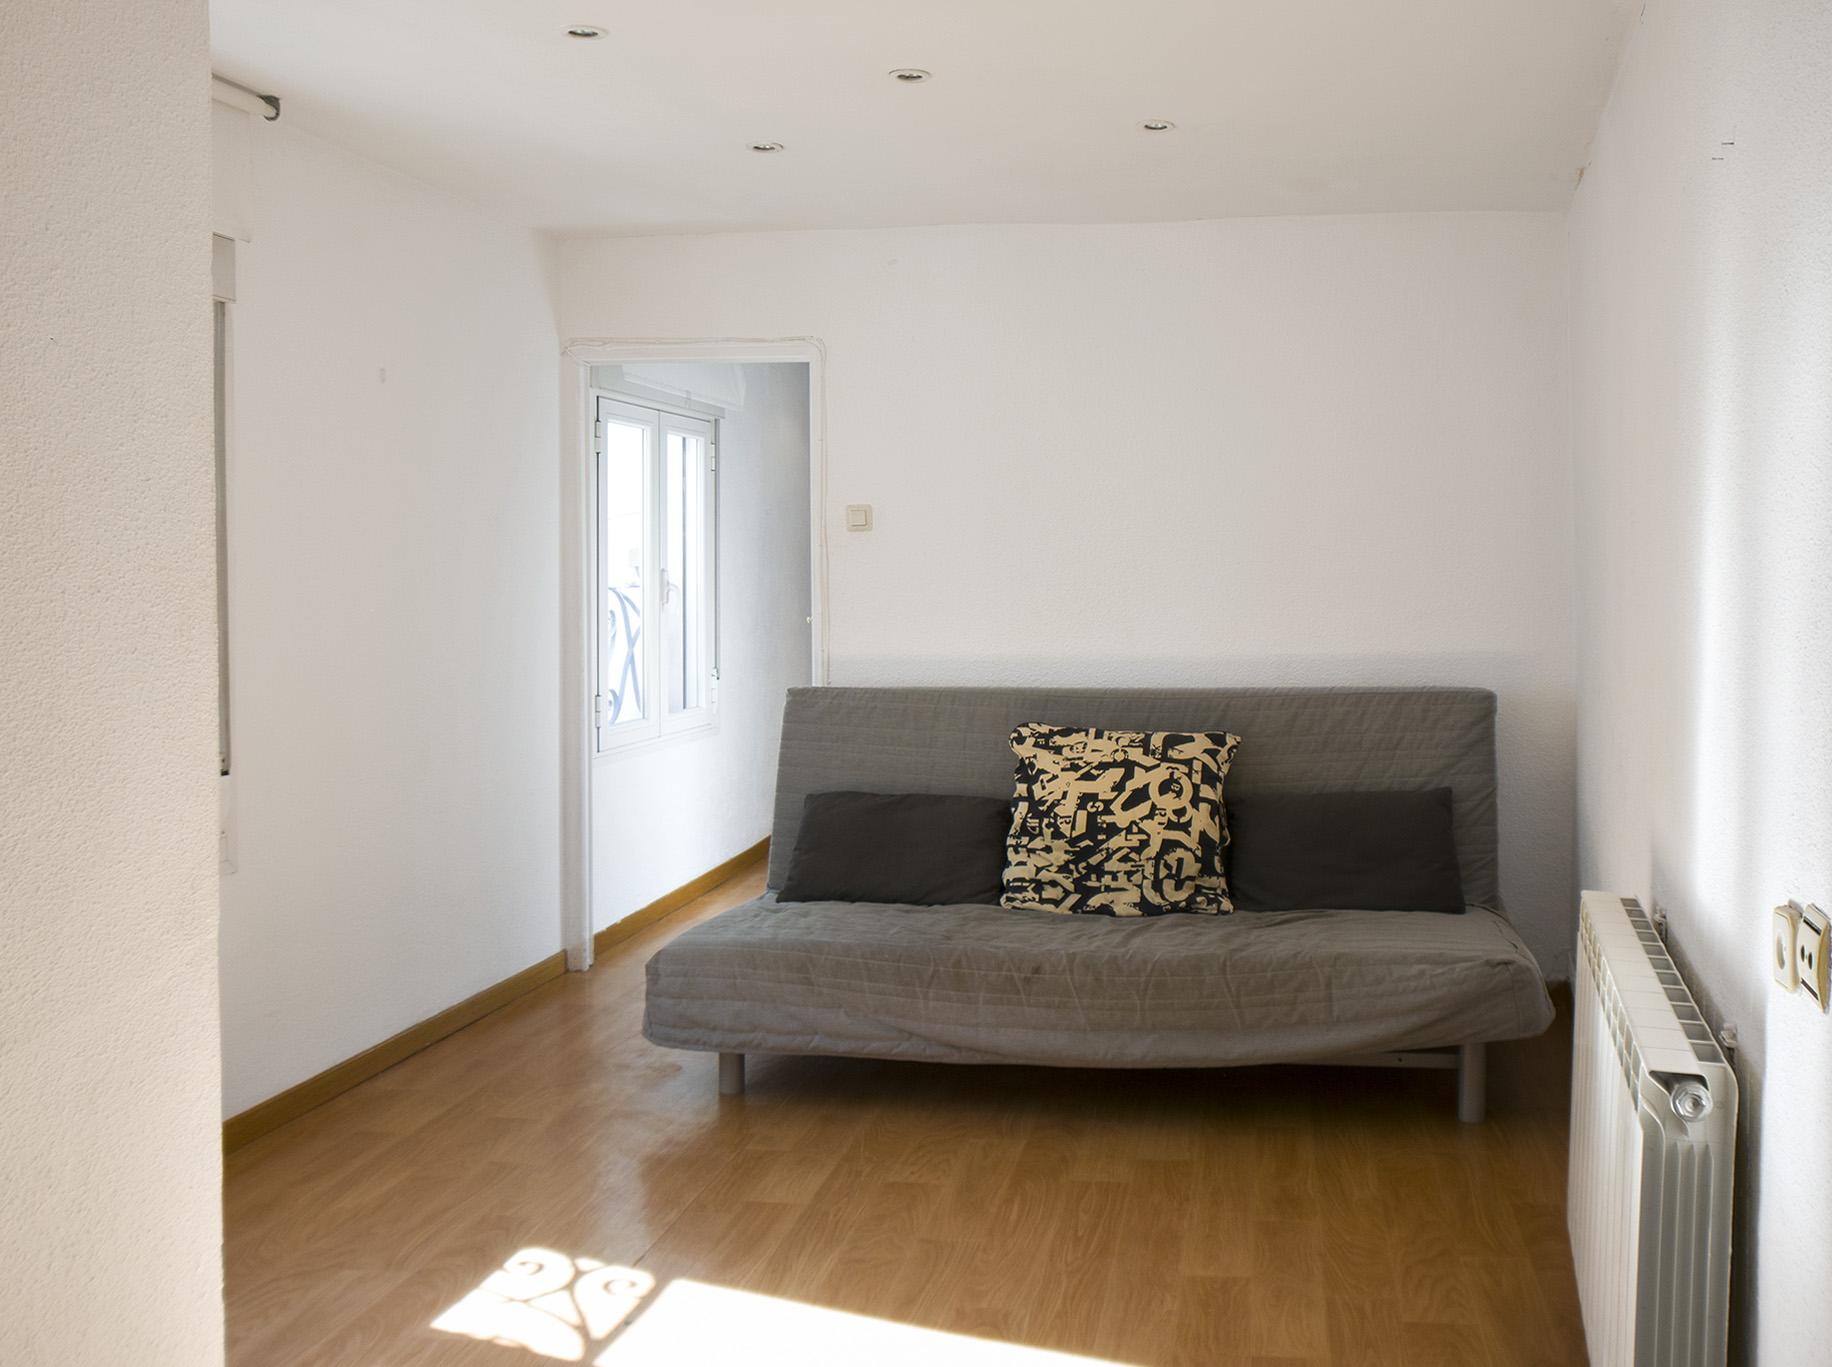 Venta Apartamento En Calle Espíritu Santo | Malasaña – Madrid